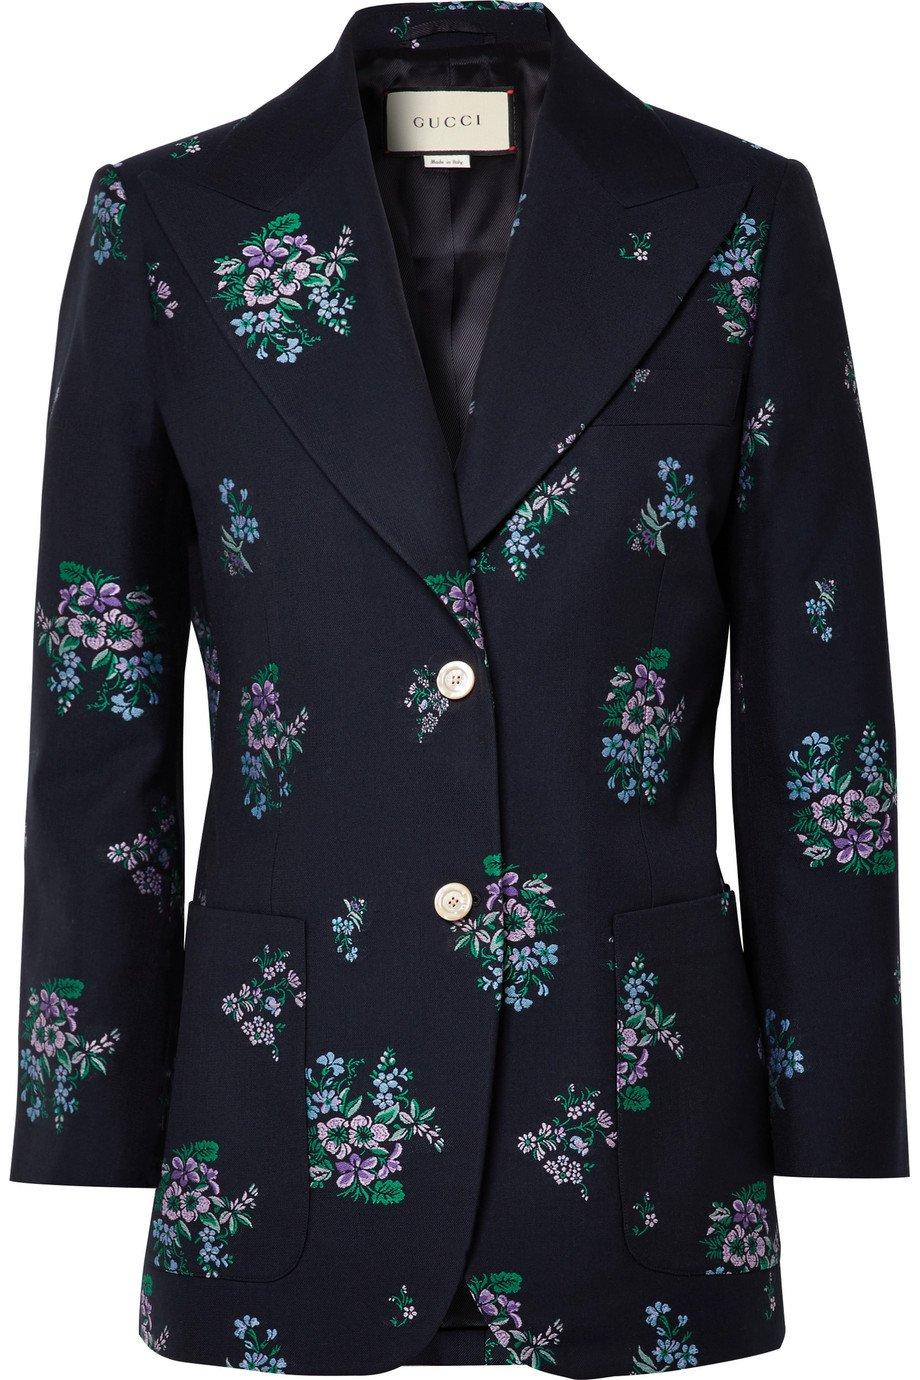 Gucci | Cotton and wool-blend jacquard blazer | NET-A-PORTER.COM